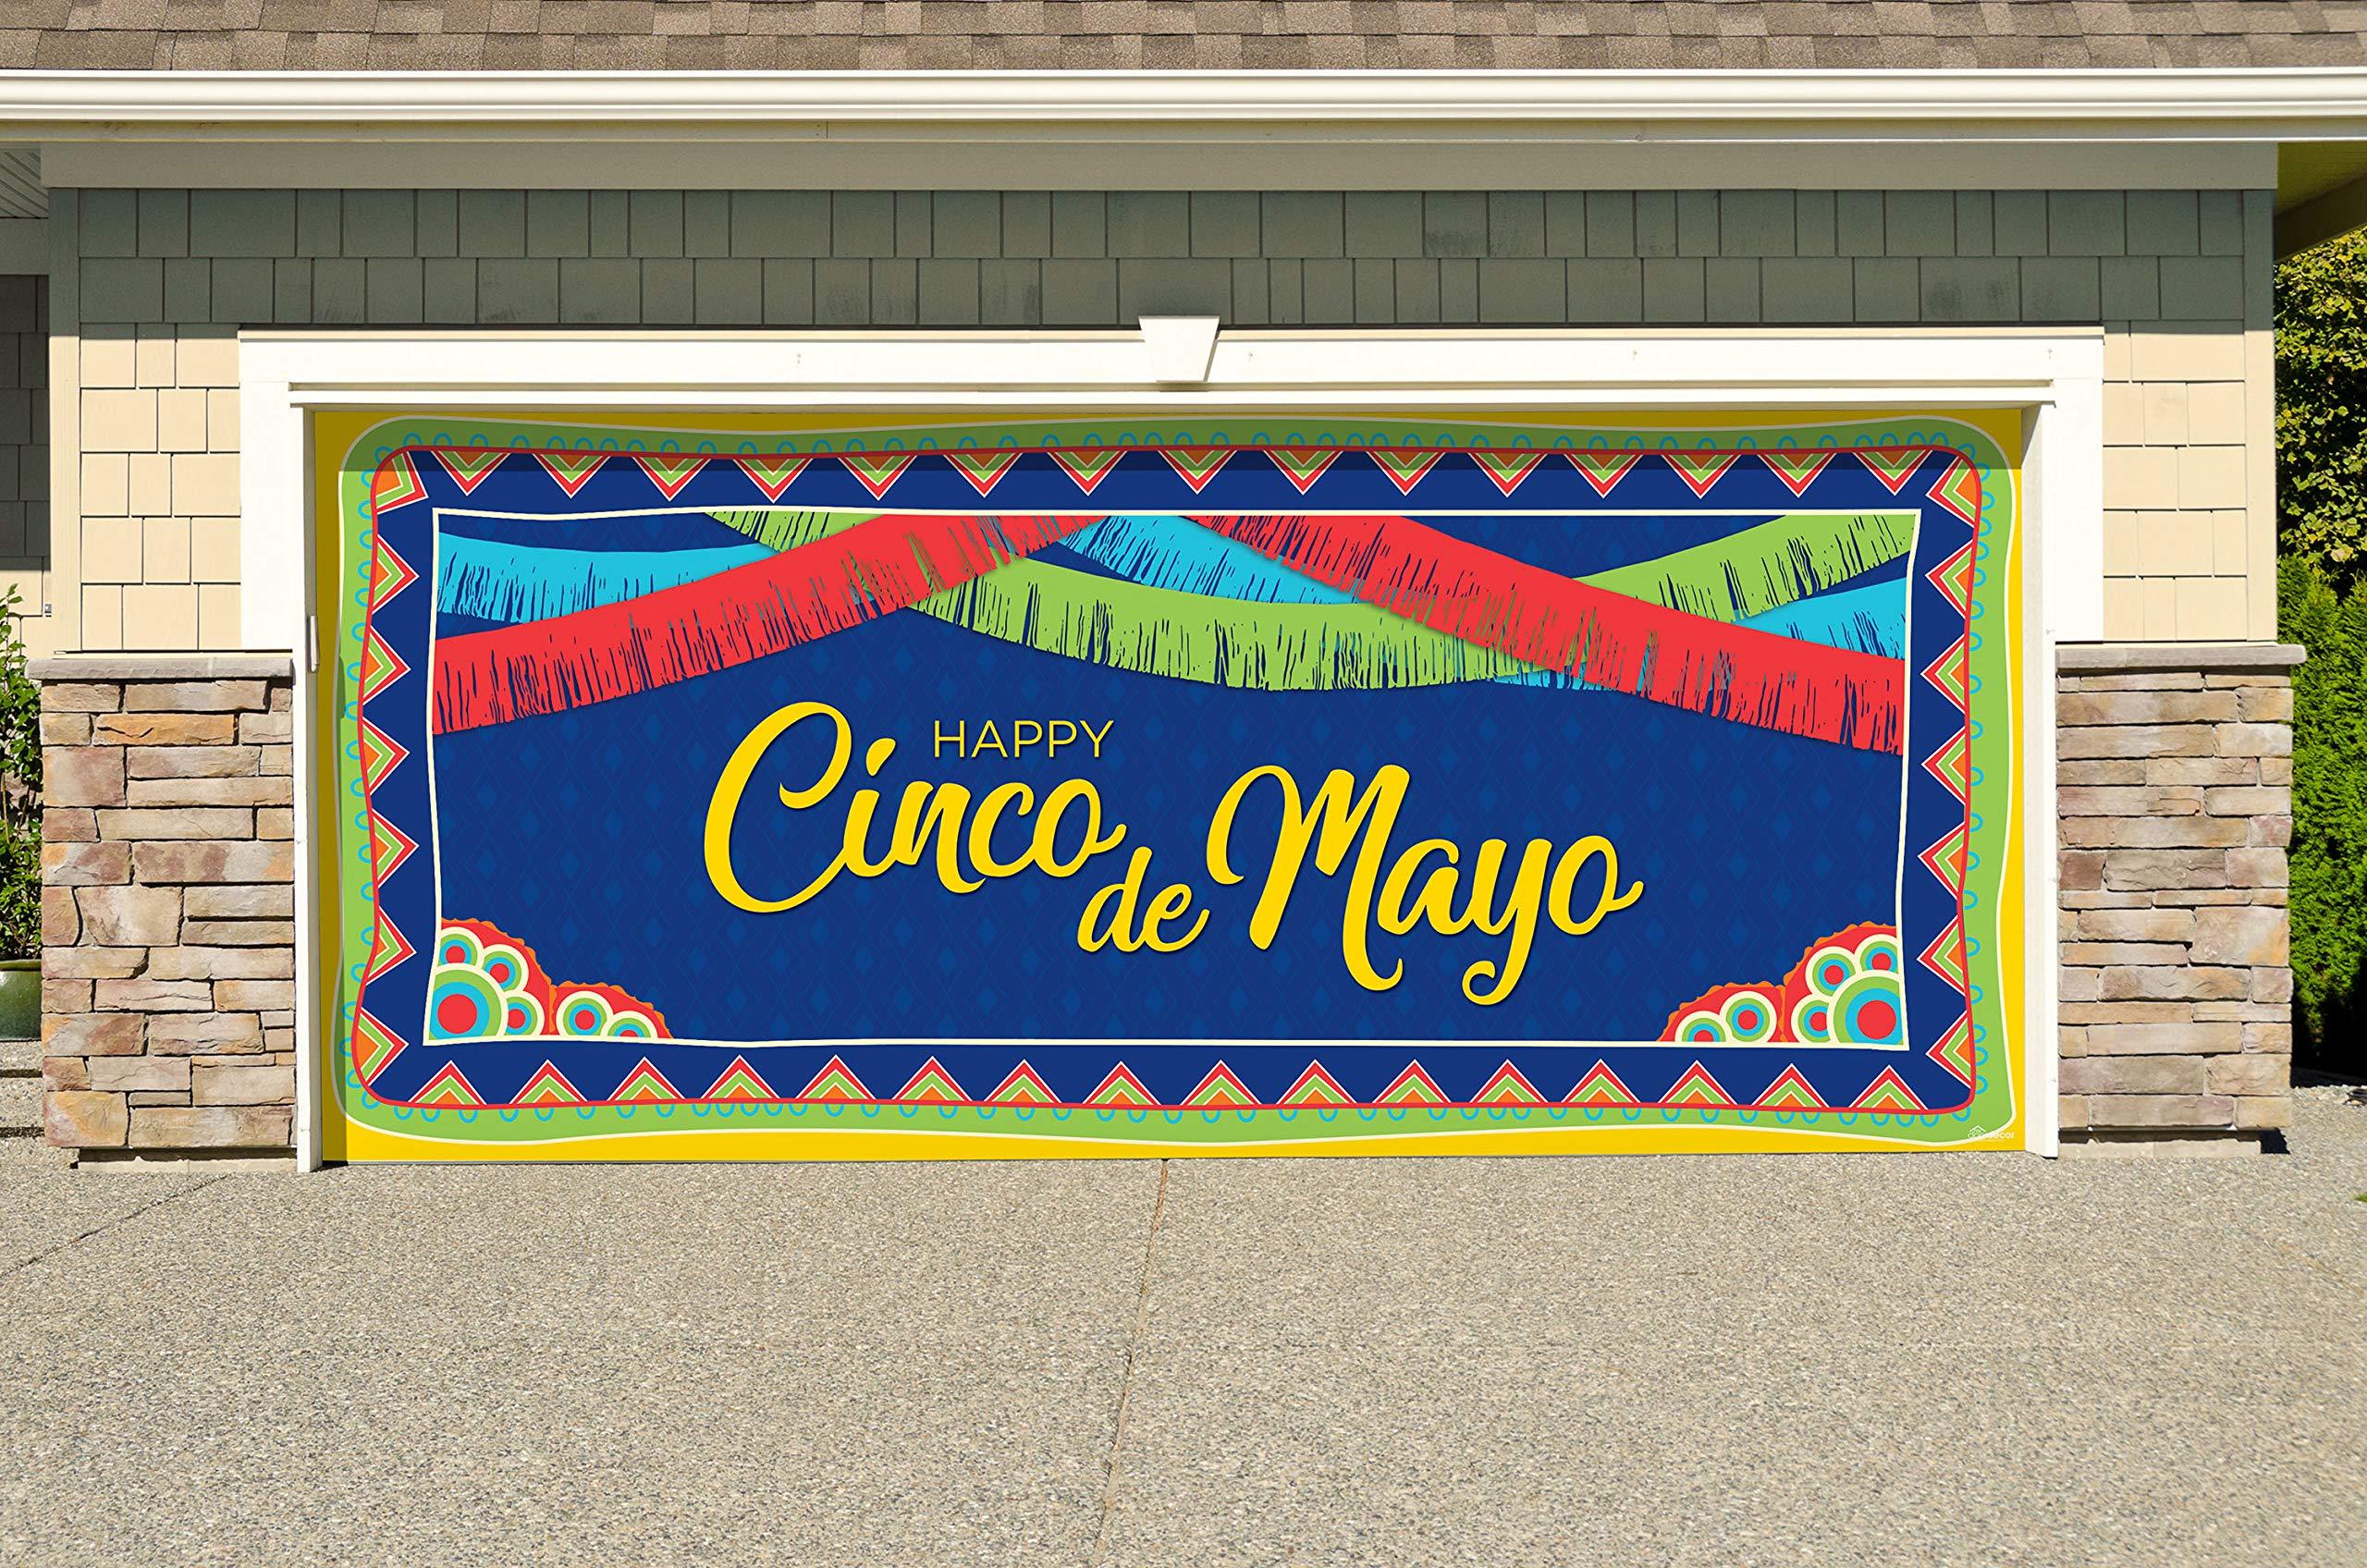 Victory Corps Happy Cinco de Mayo Pattern - Holiday Garage Door Banner Mural Sign Décor 7'x 16' Car Garage - The Original Holiday Garage Door Banner Decor